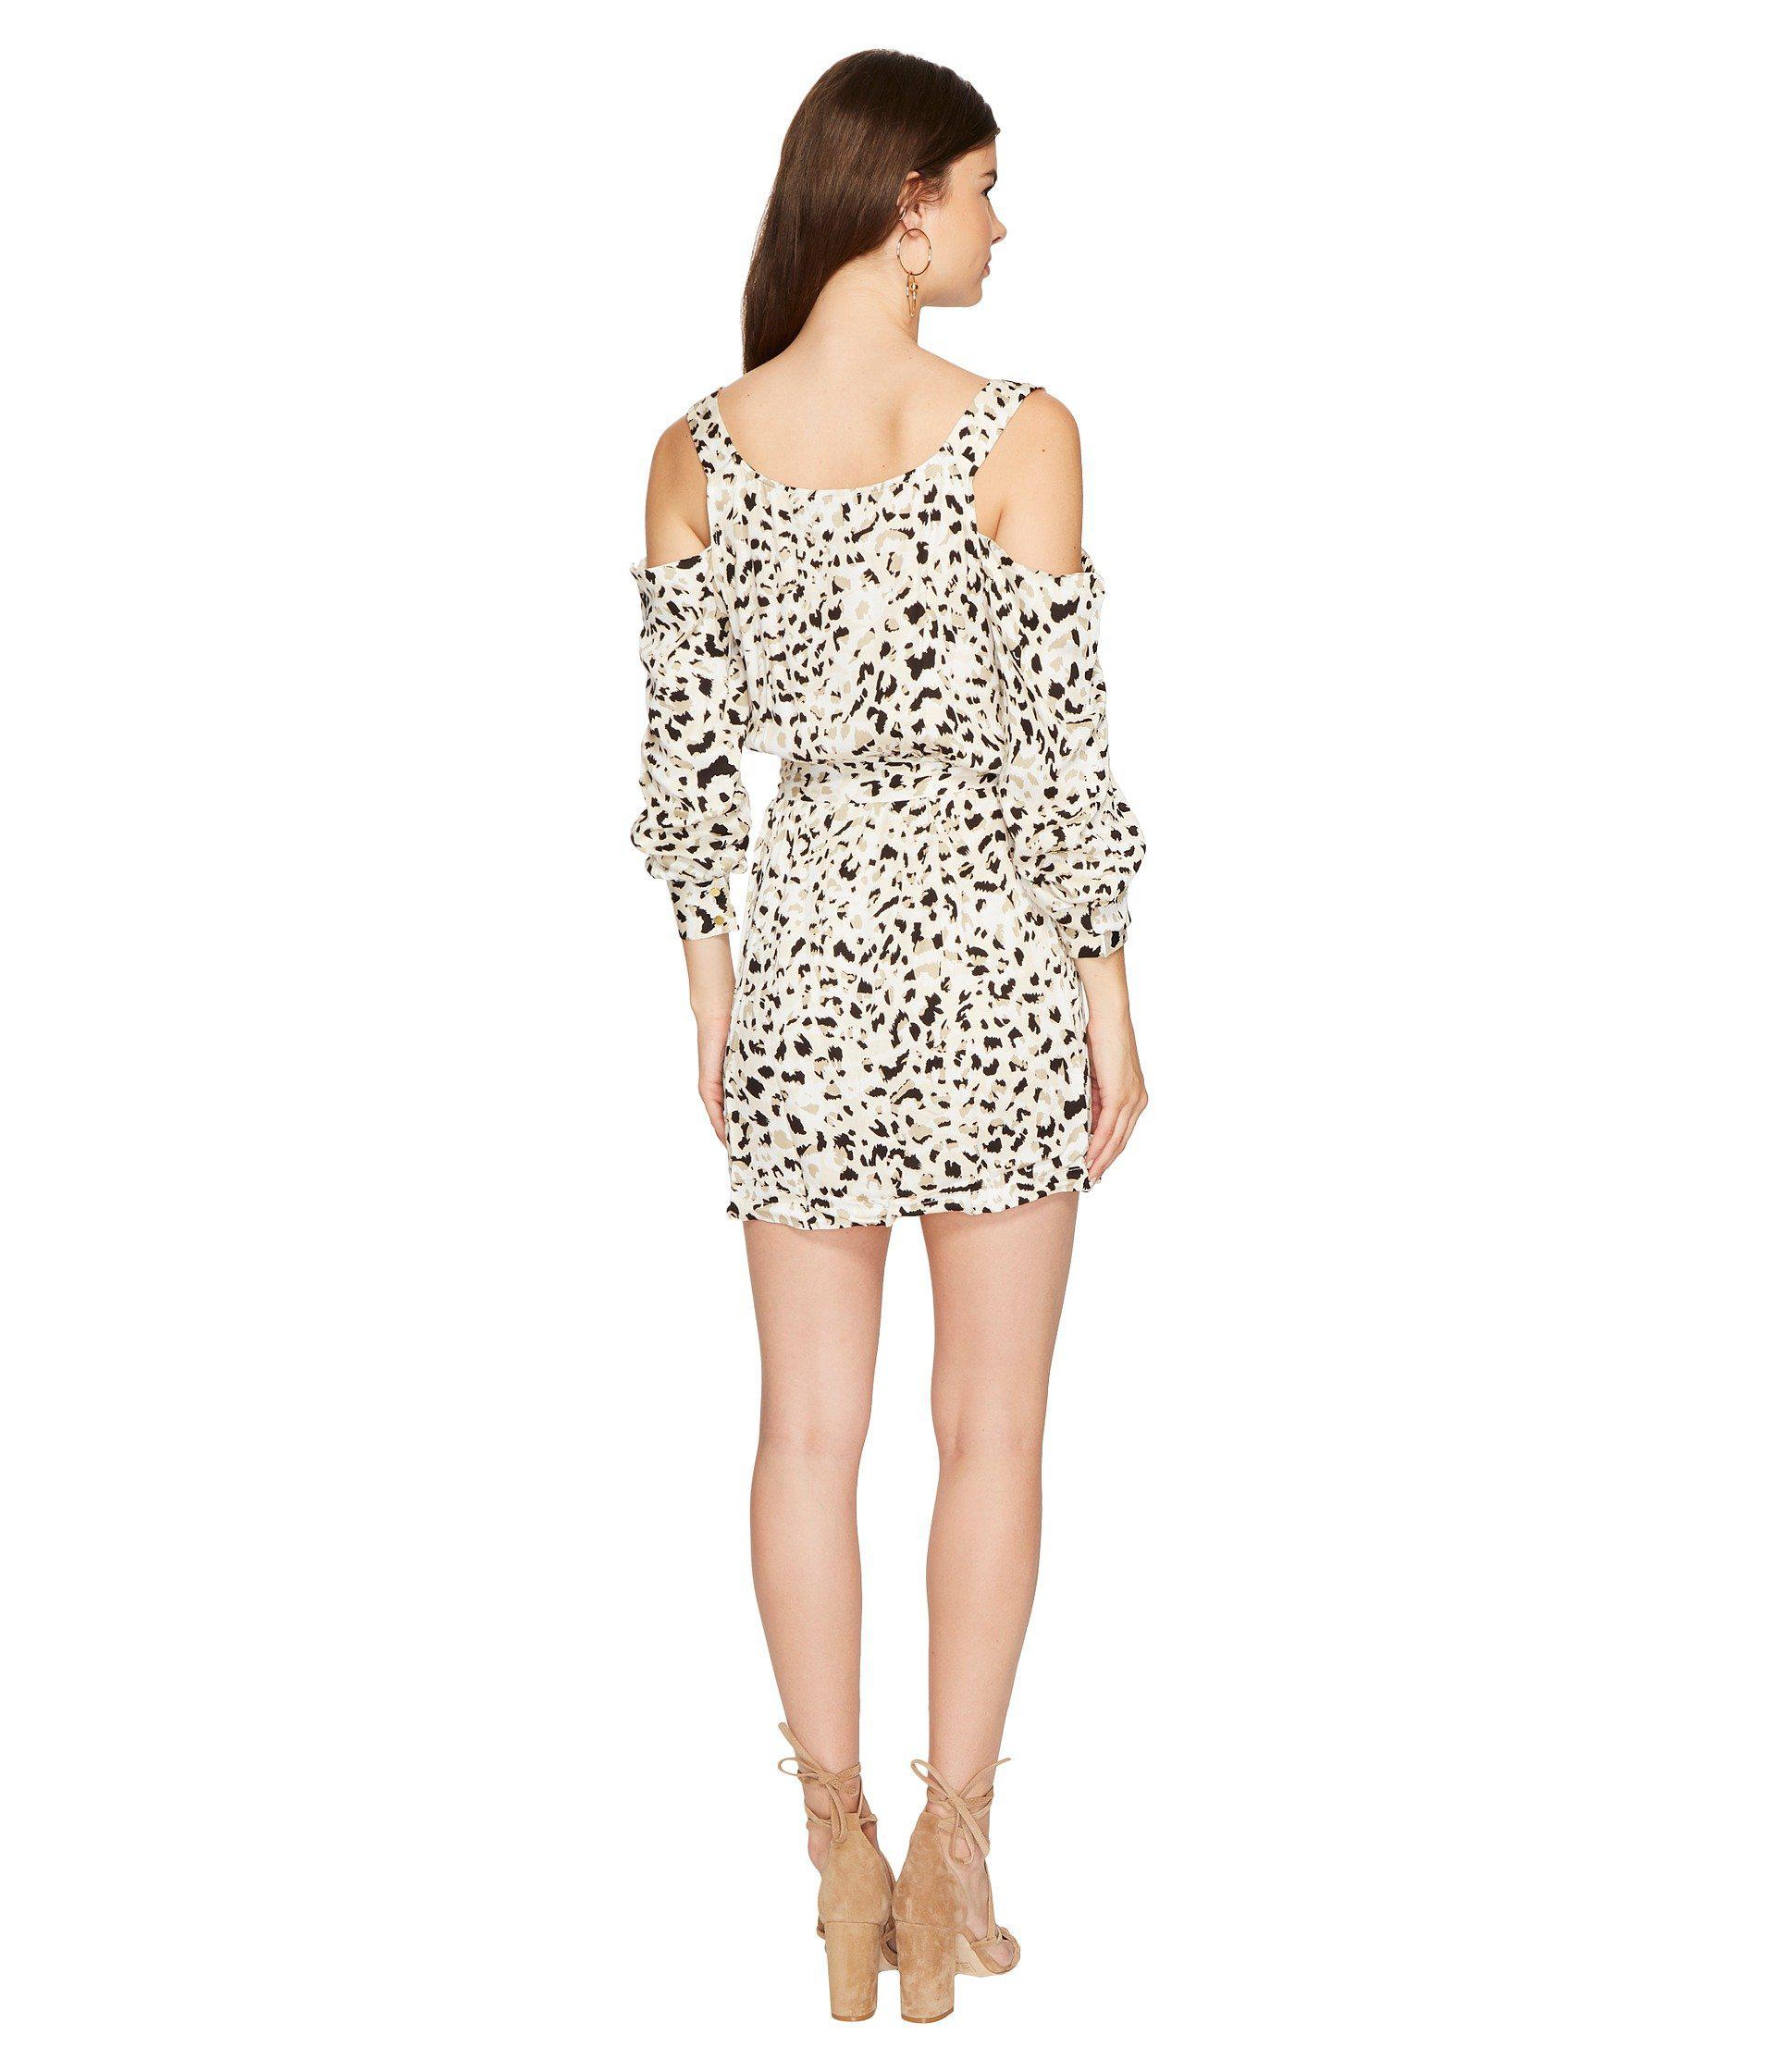 Womens Sumatran Cold Shoulder Dress Minkpink Discount Aaa cNTKWOlmA